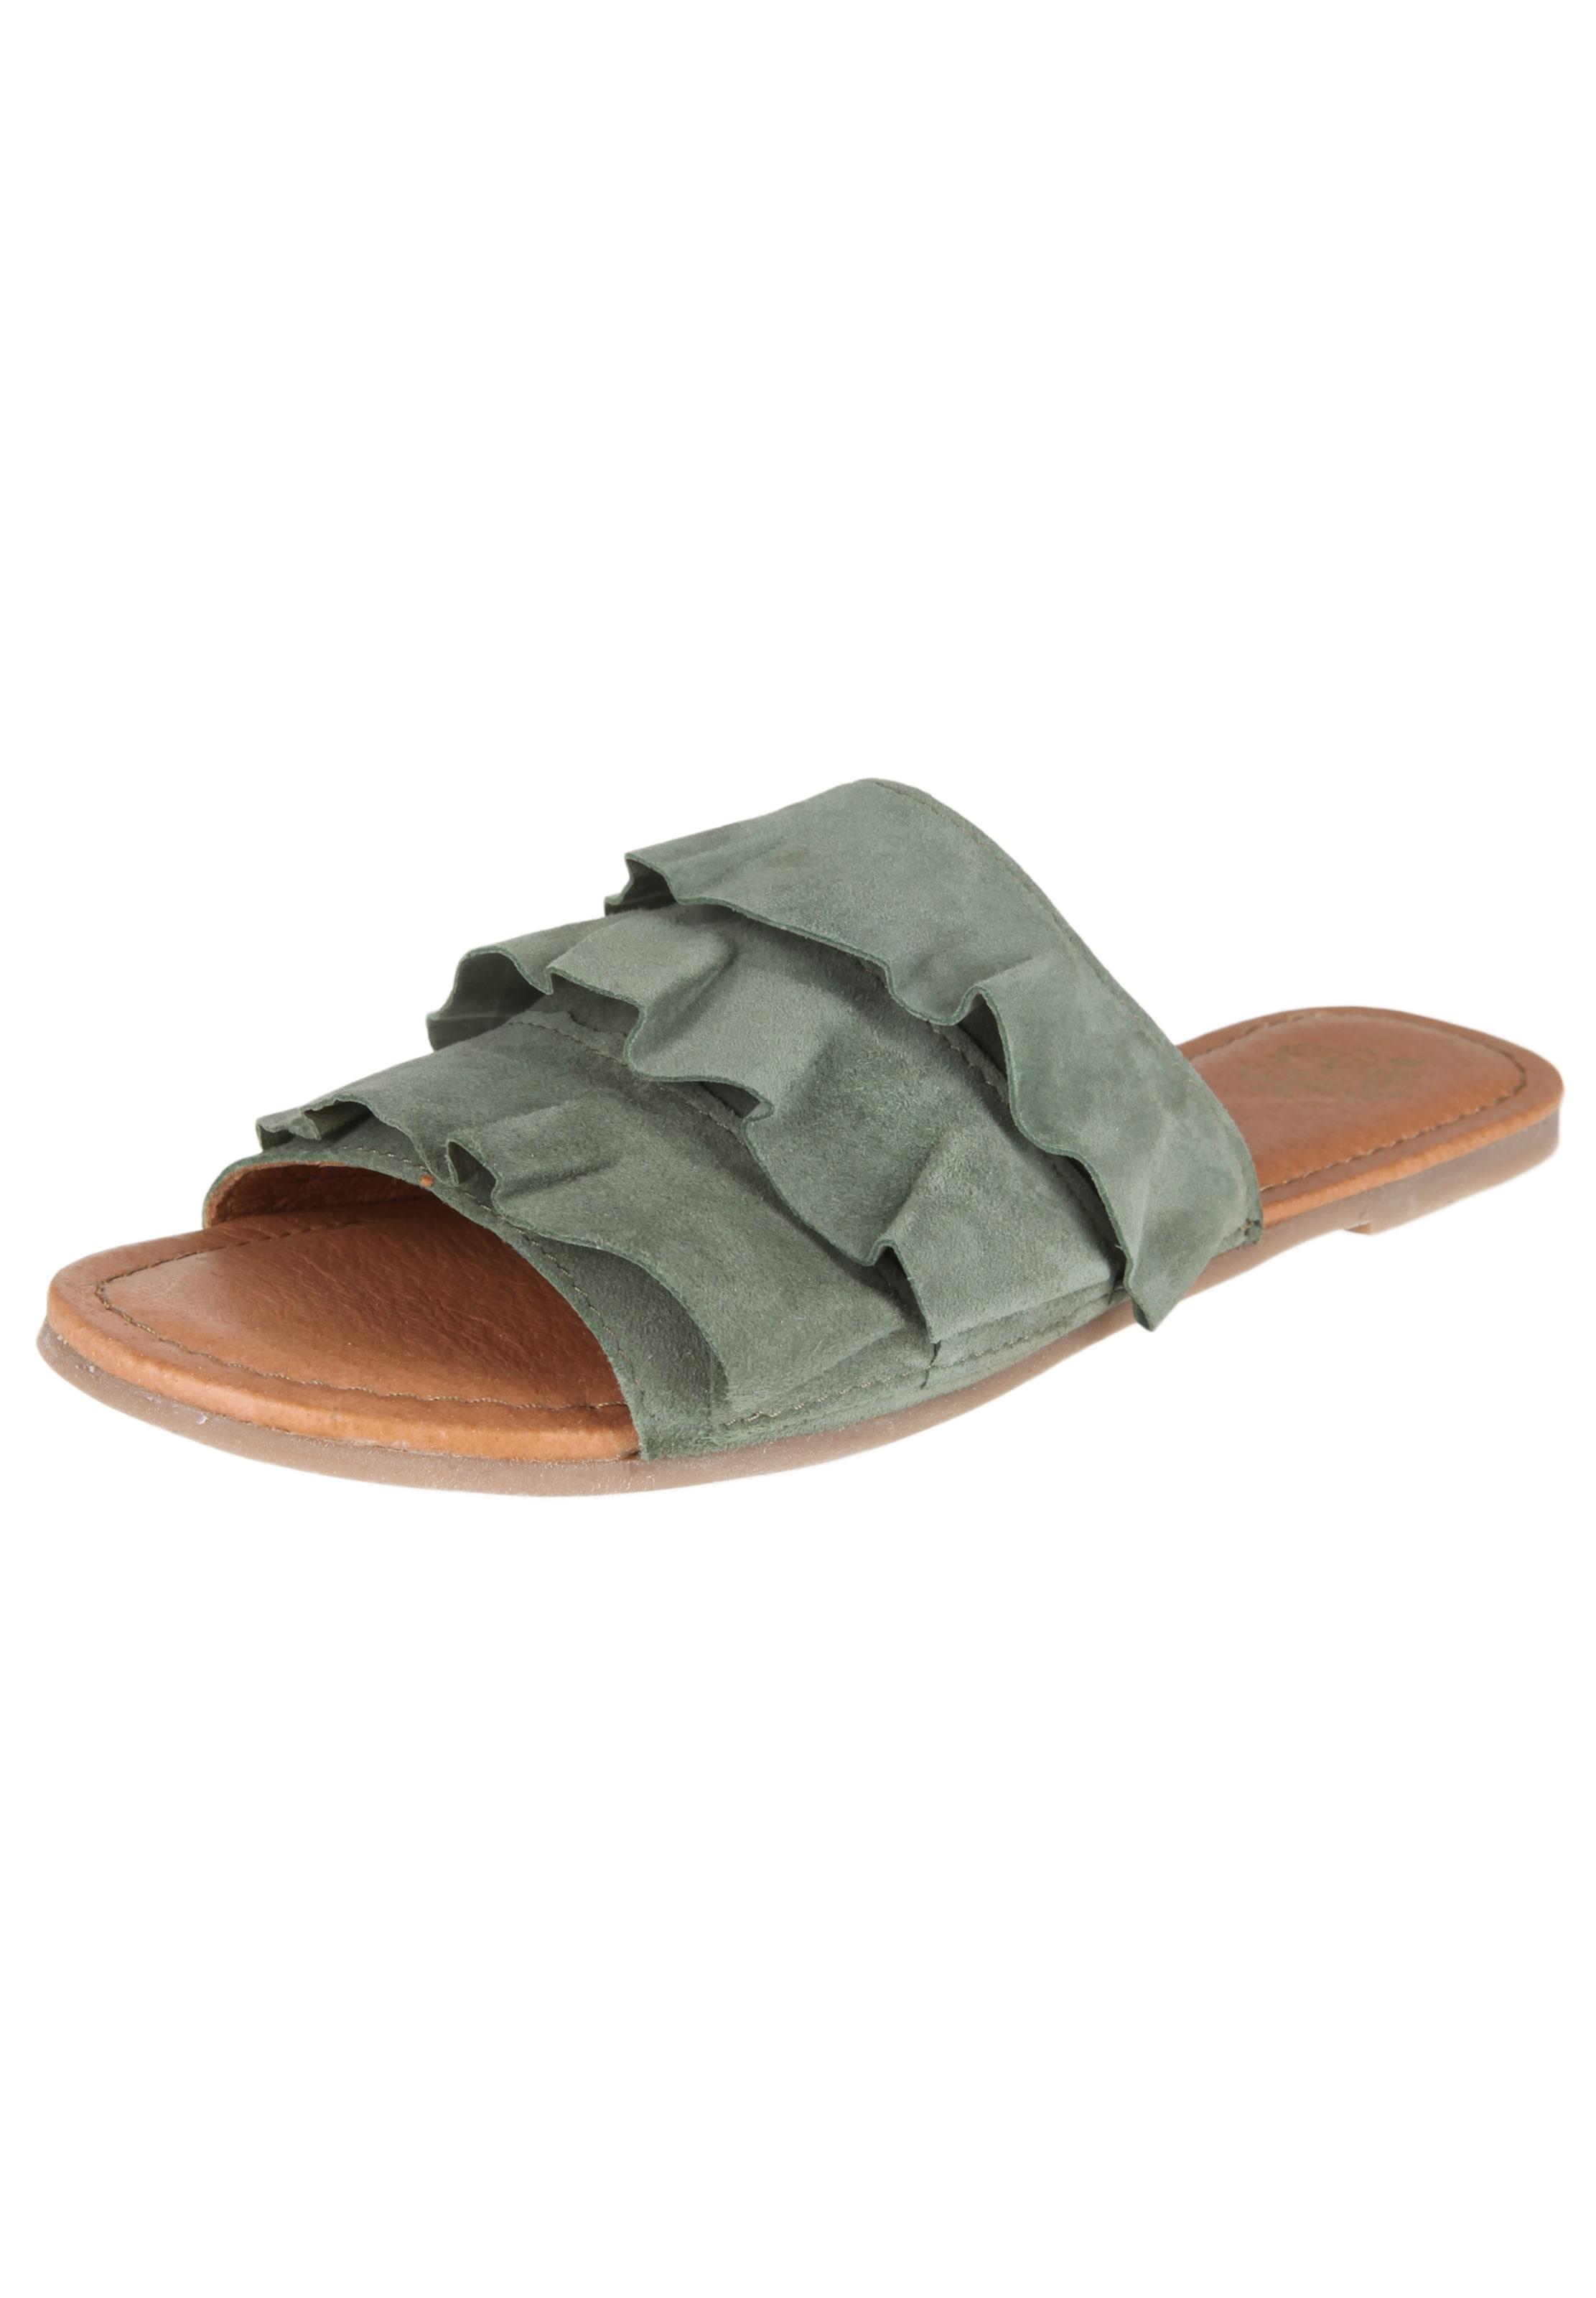 Apple Khaki Sandale Eden In 'shelby' Of 6IfgmYvb7y